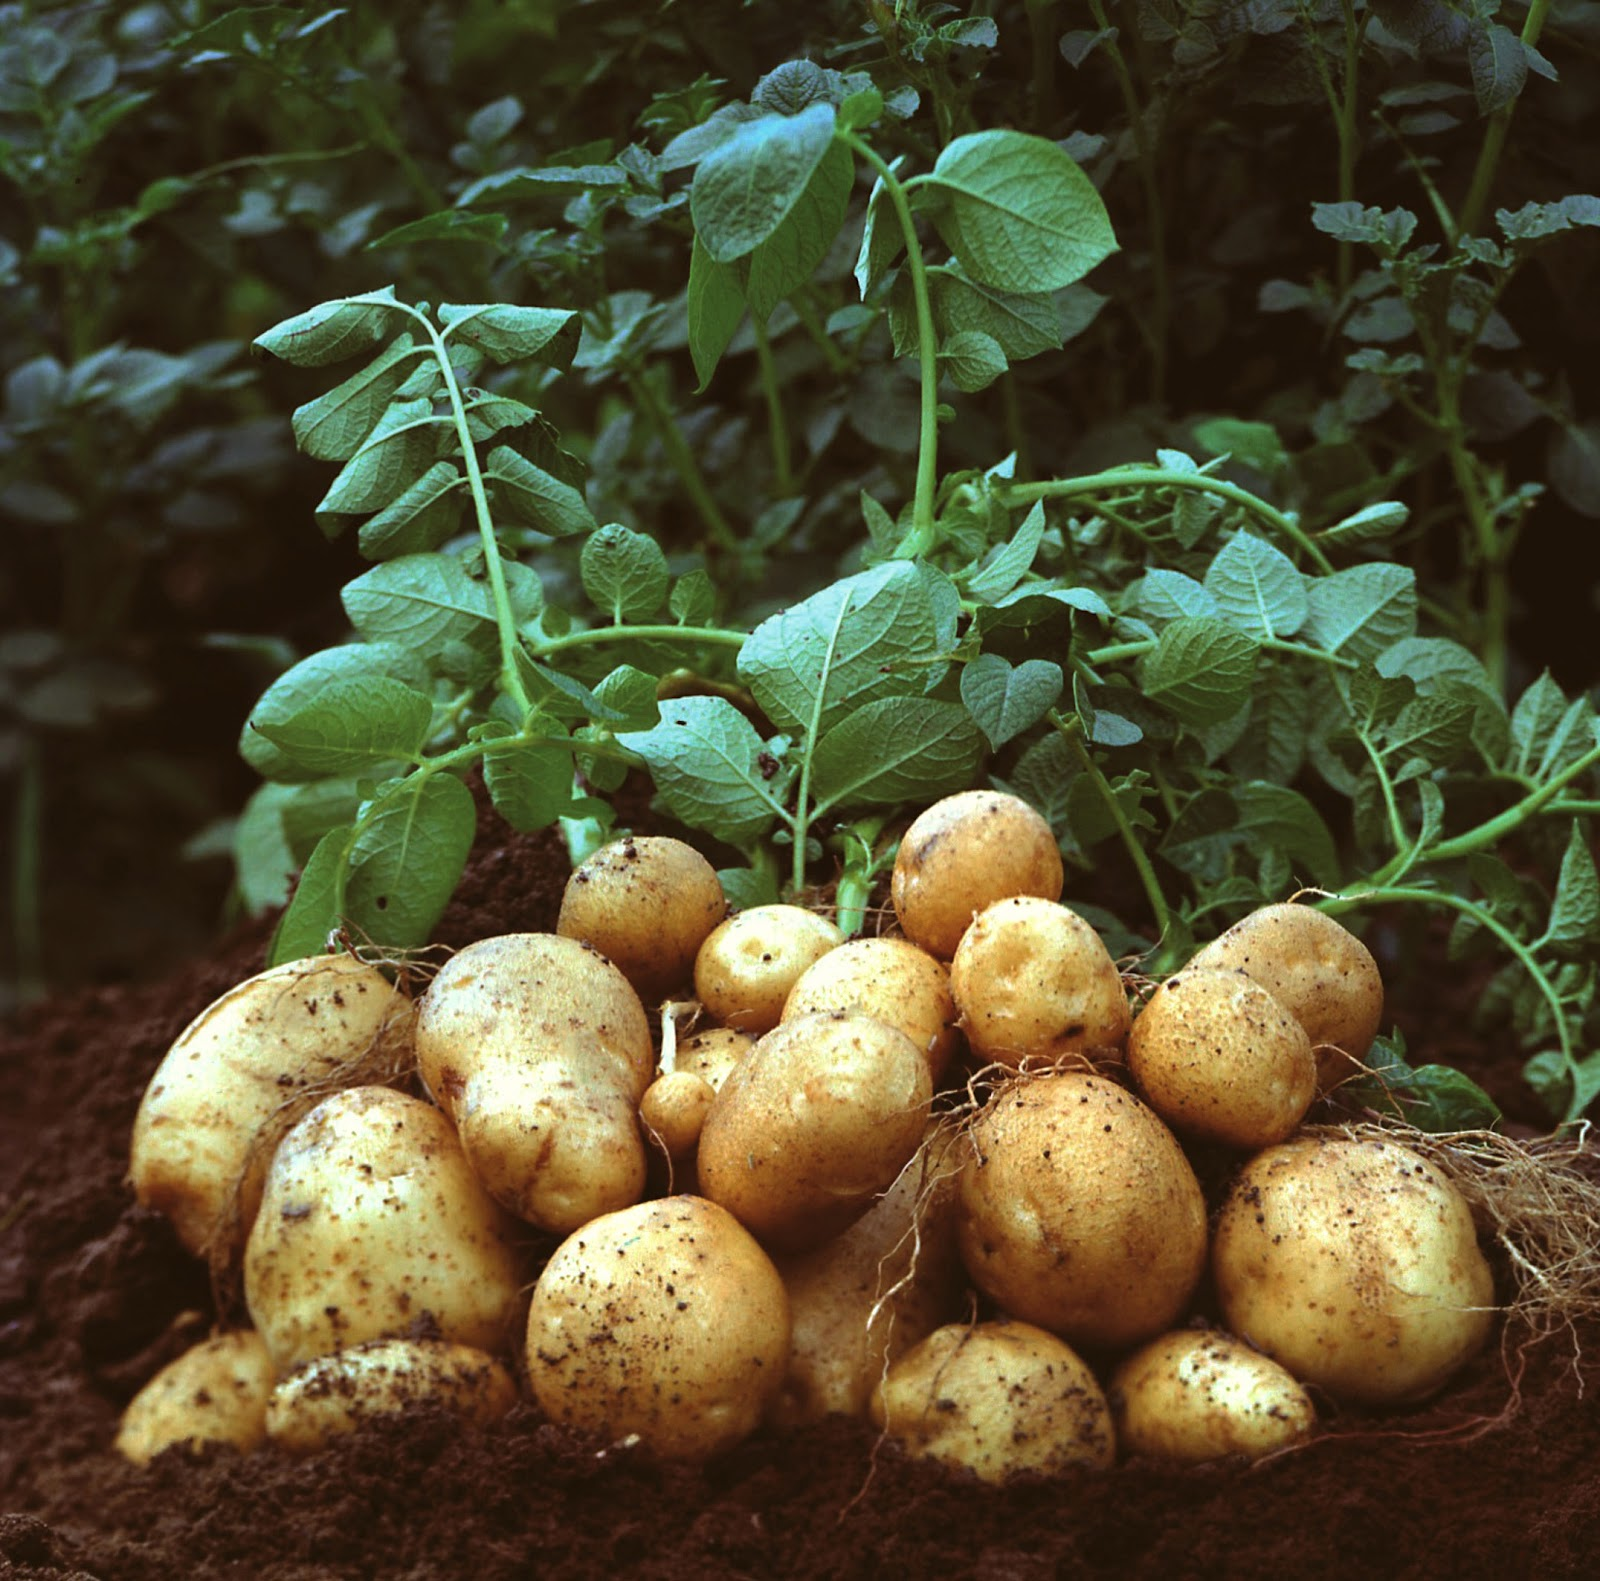 http://www.texilaconnect.com/wp-content/uploads/2014/06/potato-plant.jpg